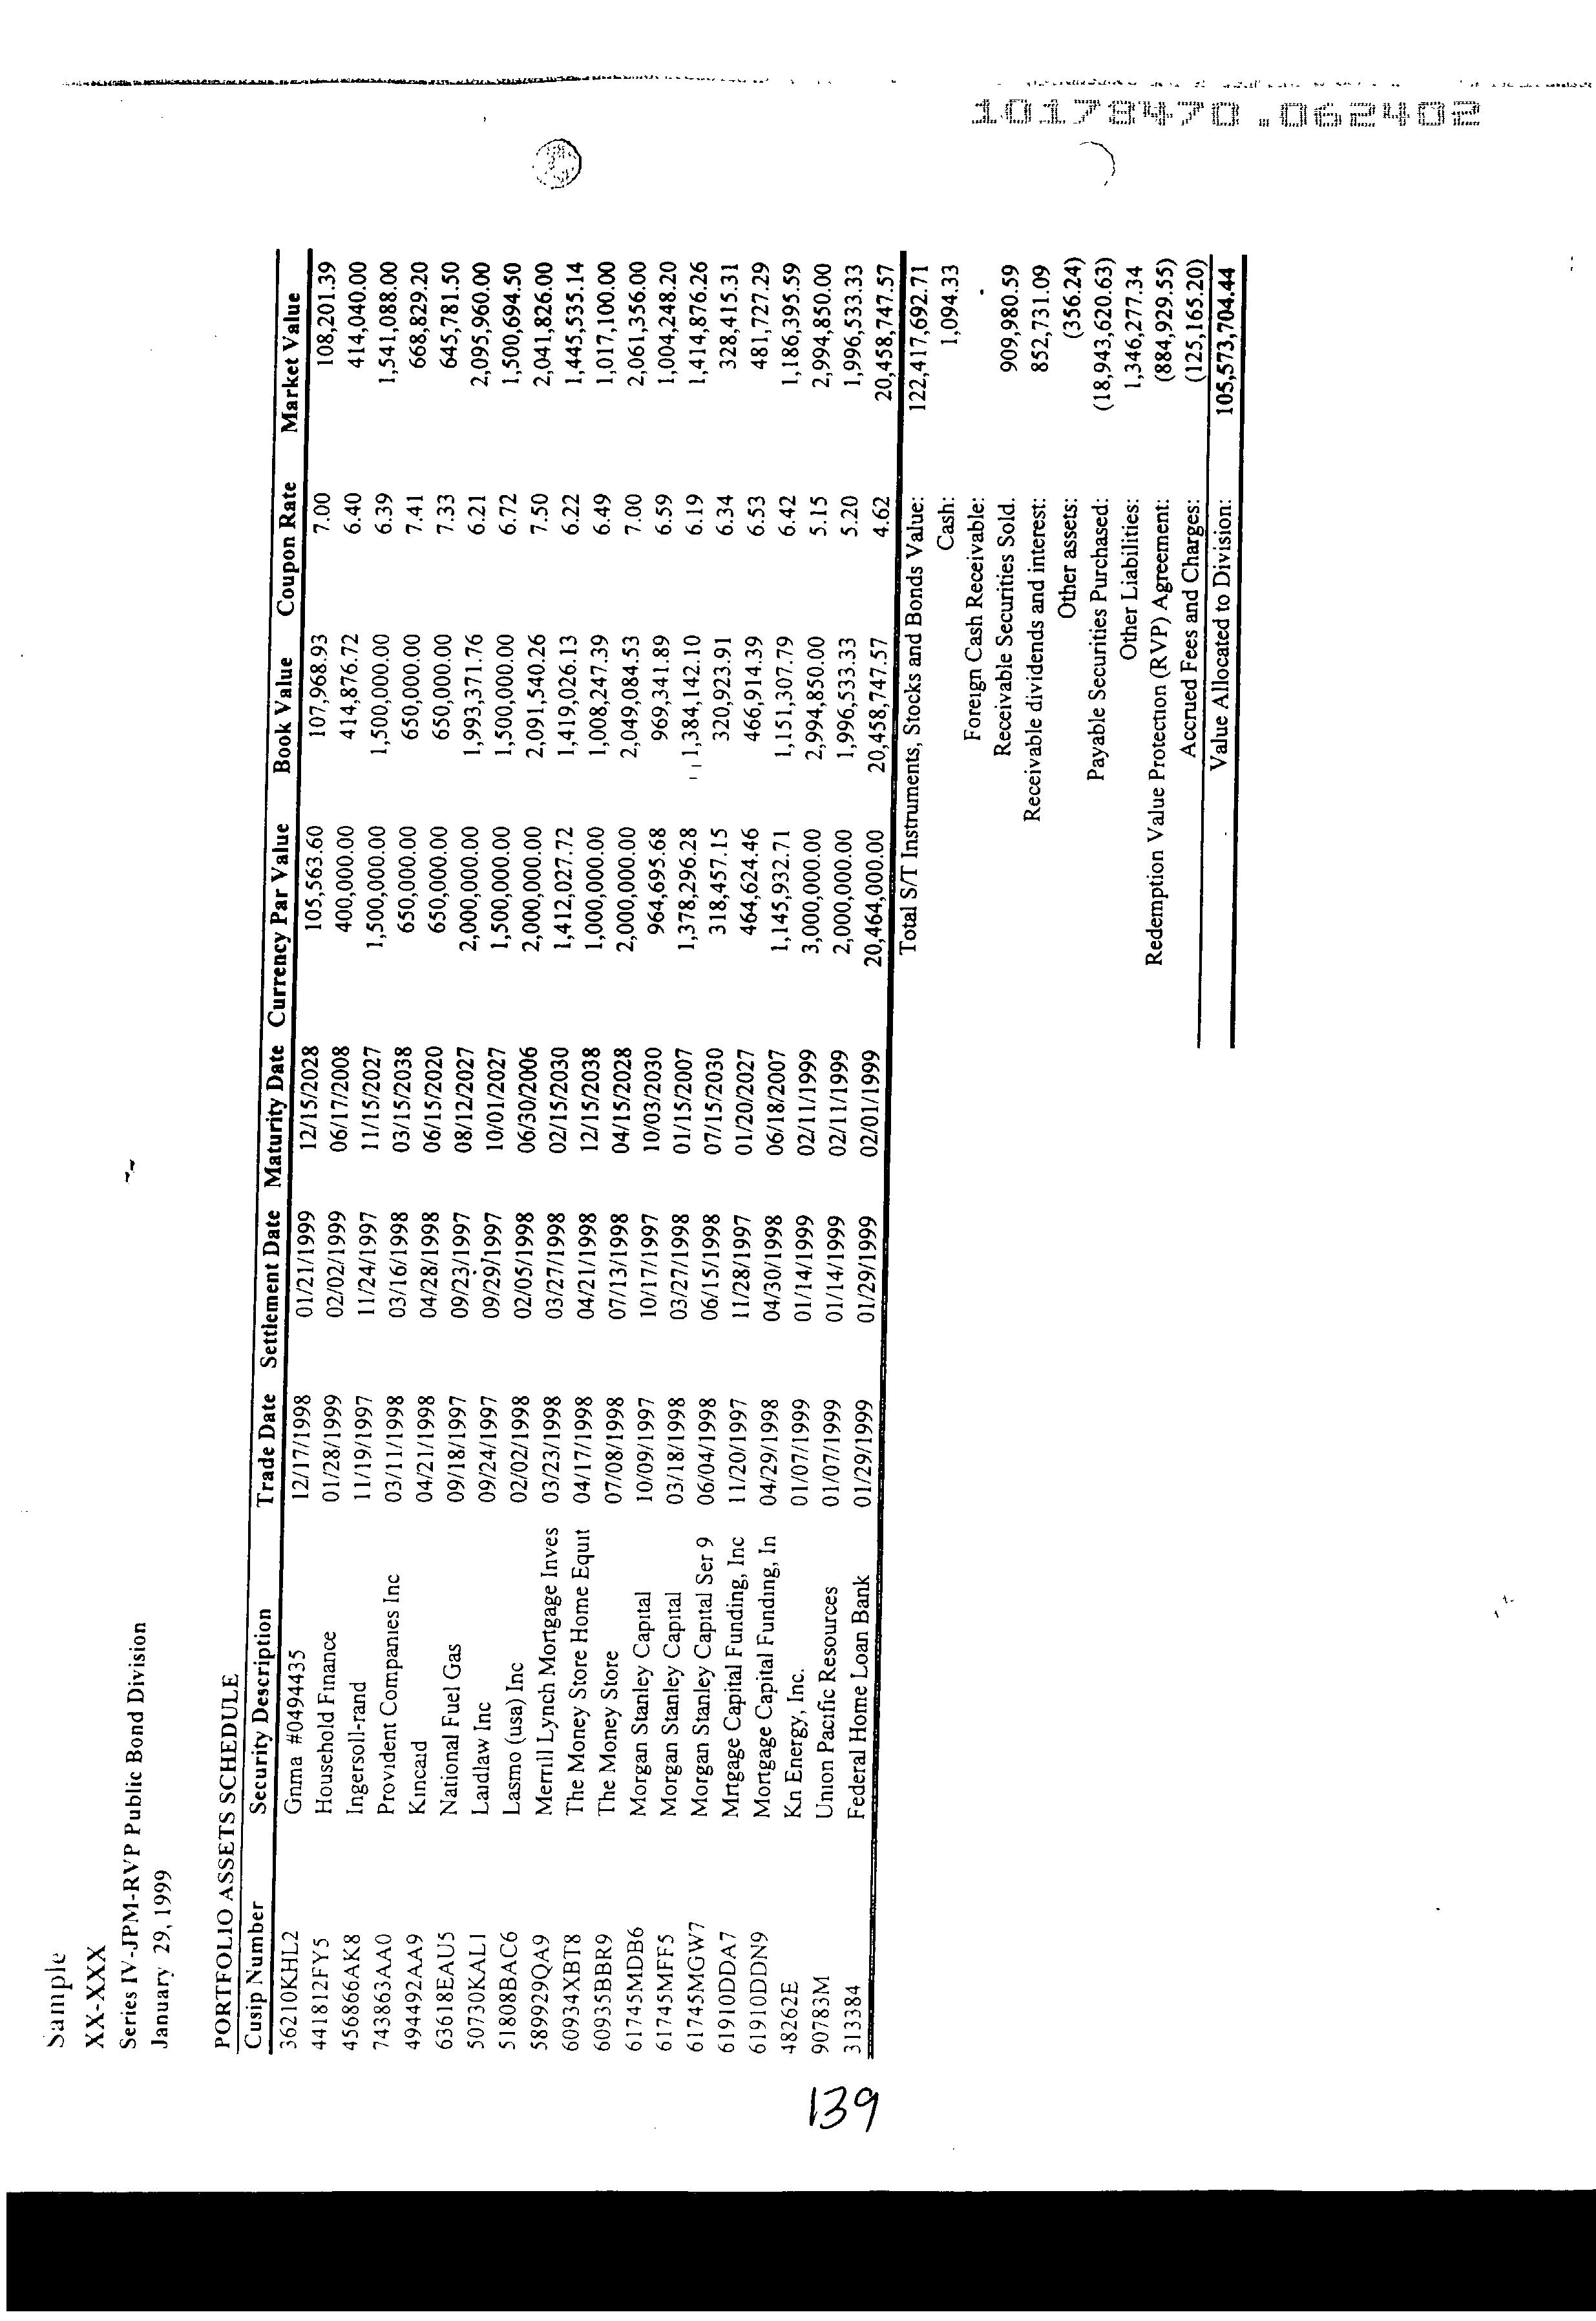 Figure US20030078815A1-20030424-P00029